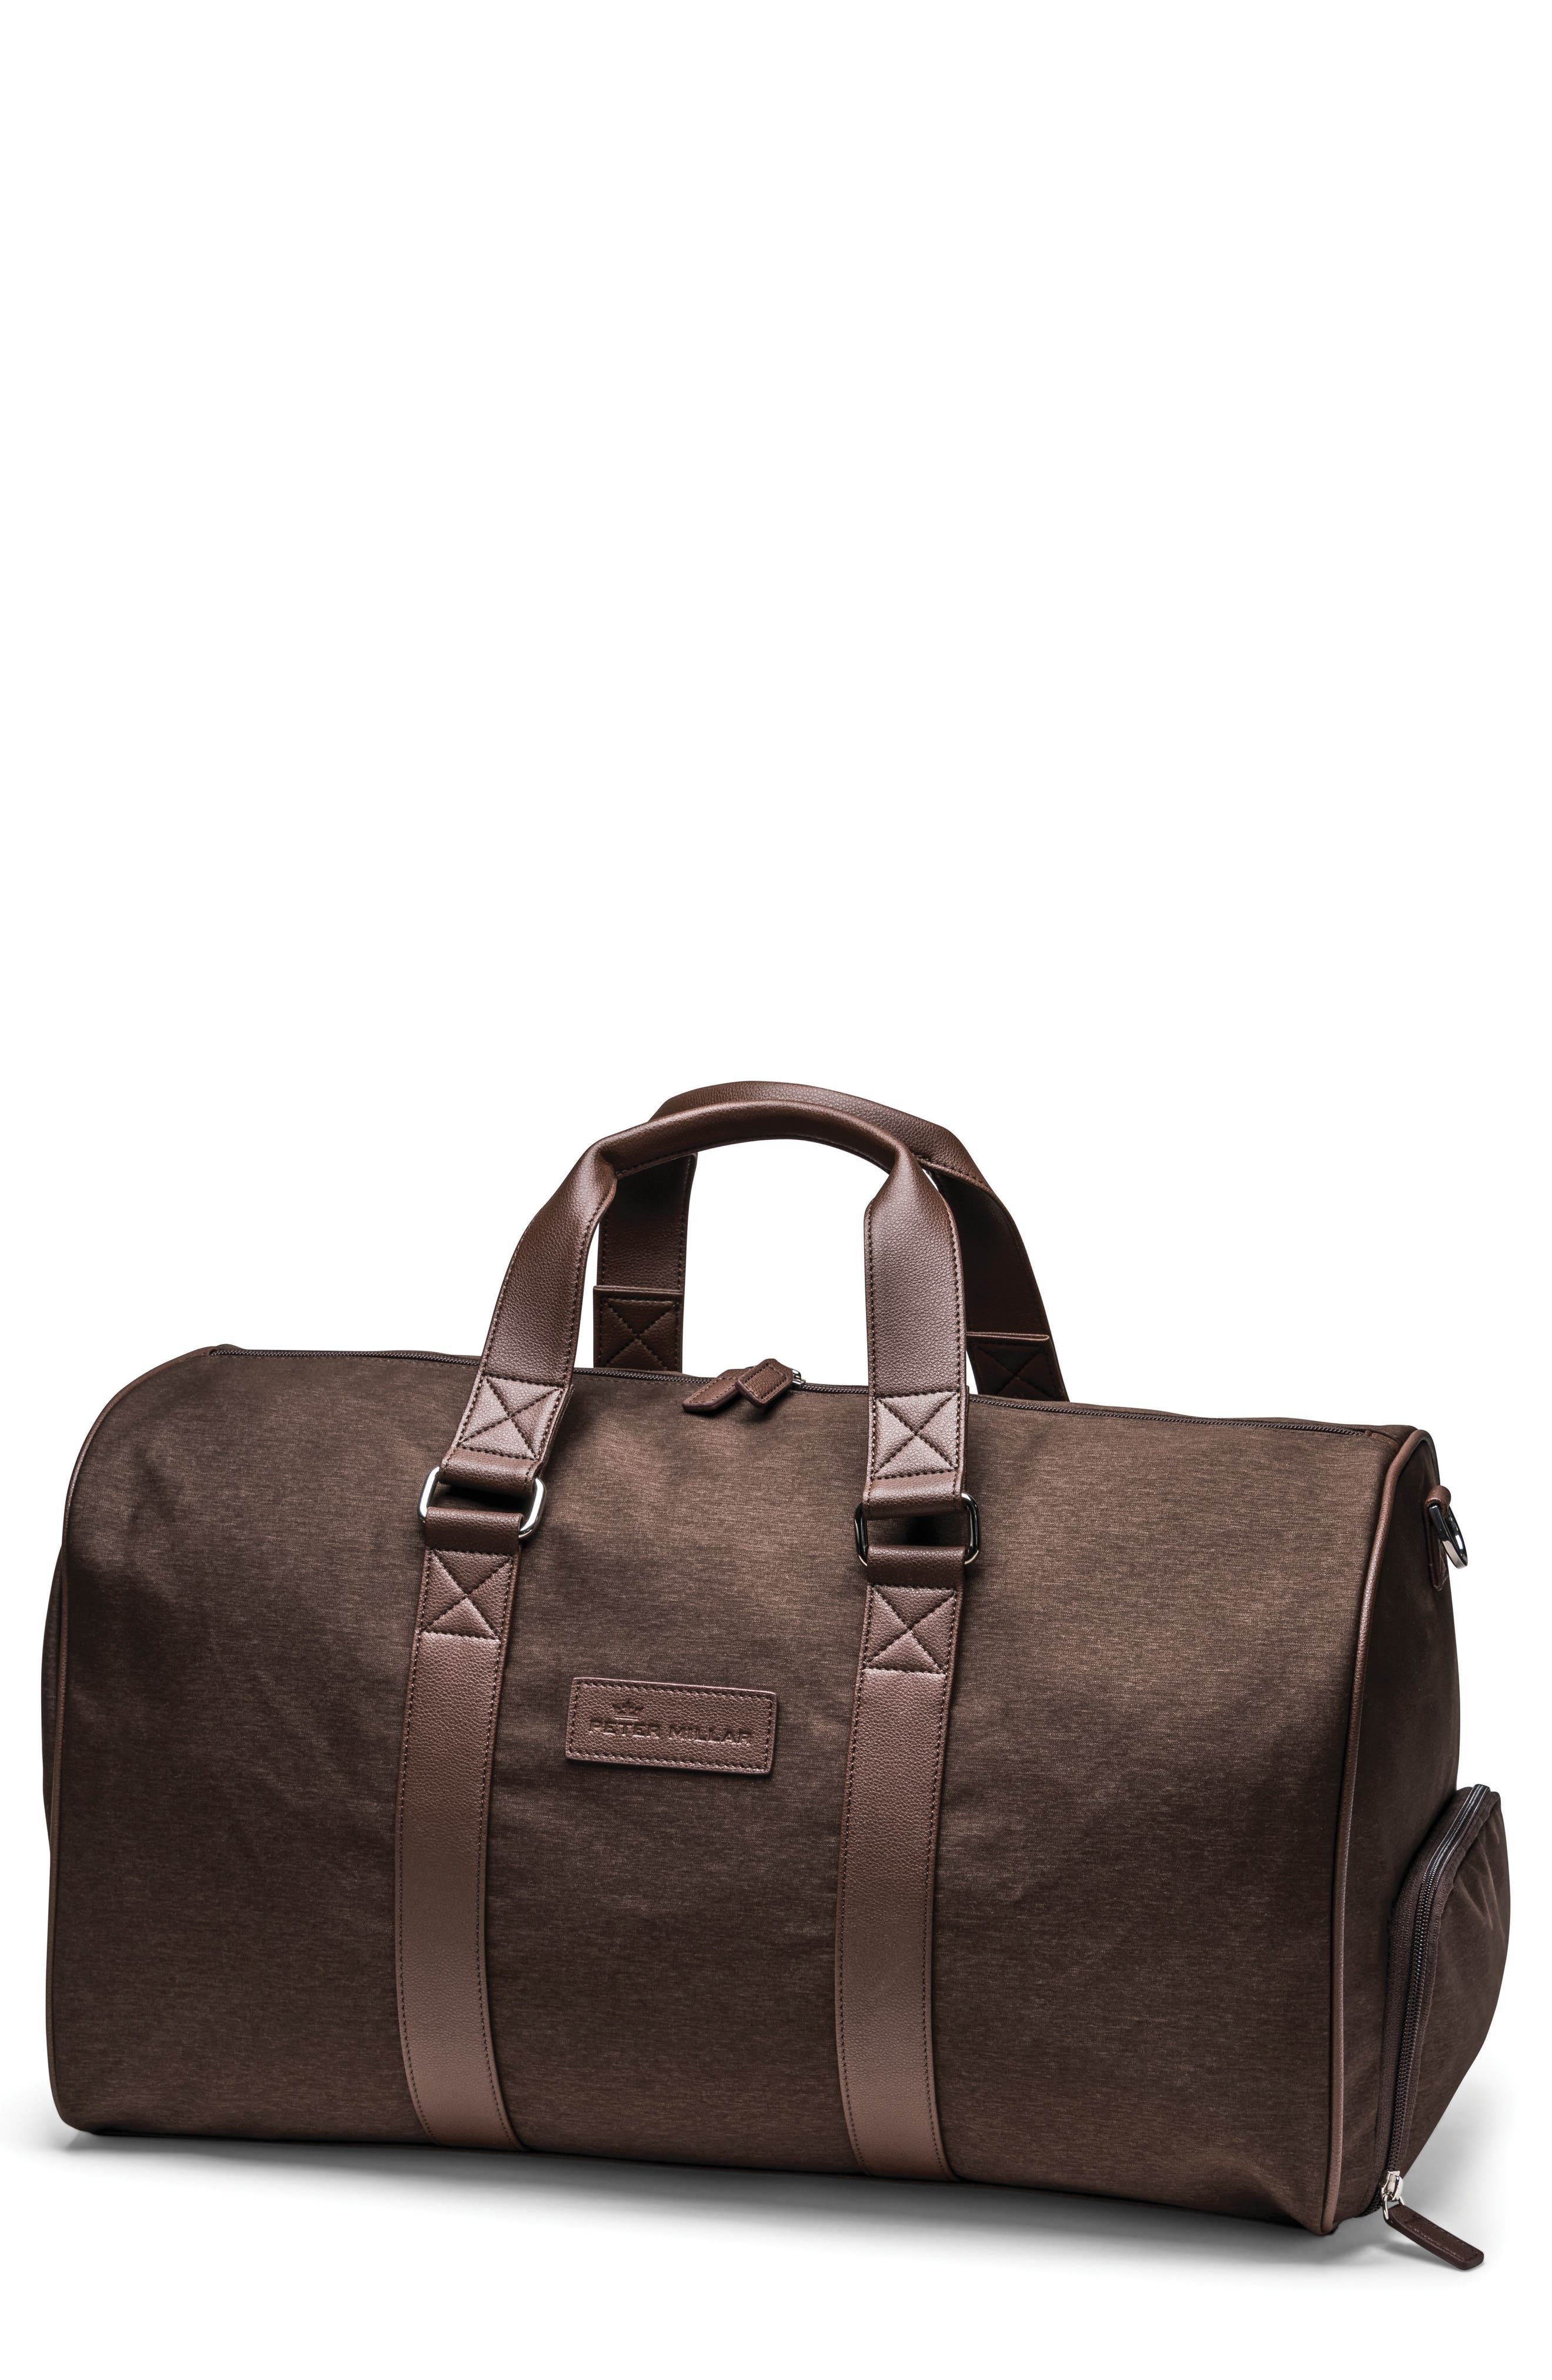 Twill Duffel Bag,                             Main thumbnail 1, color,                             Chocolate